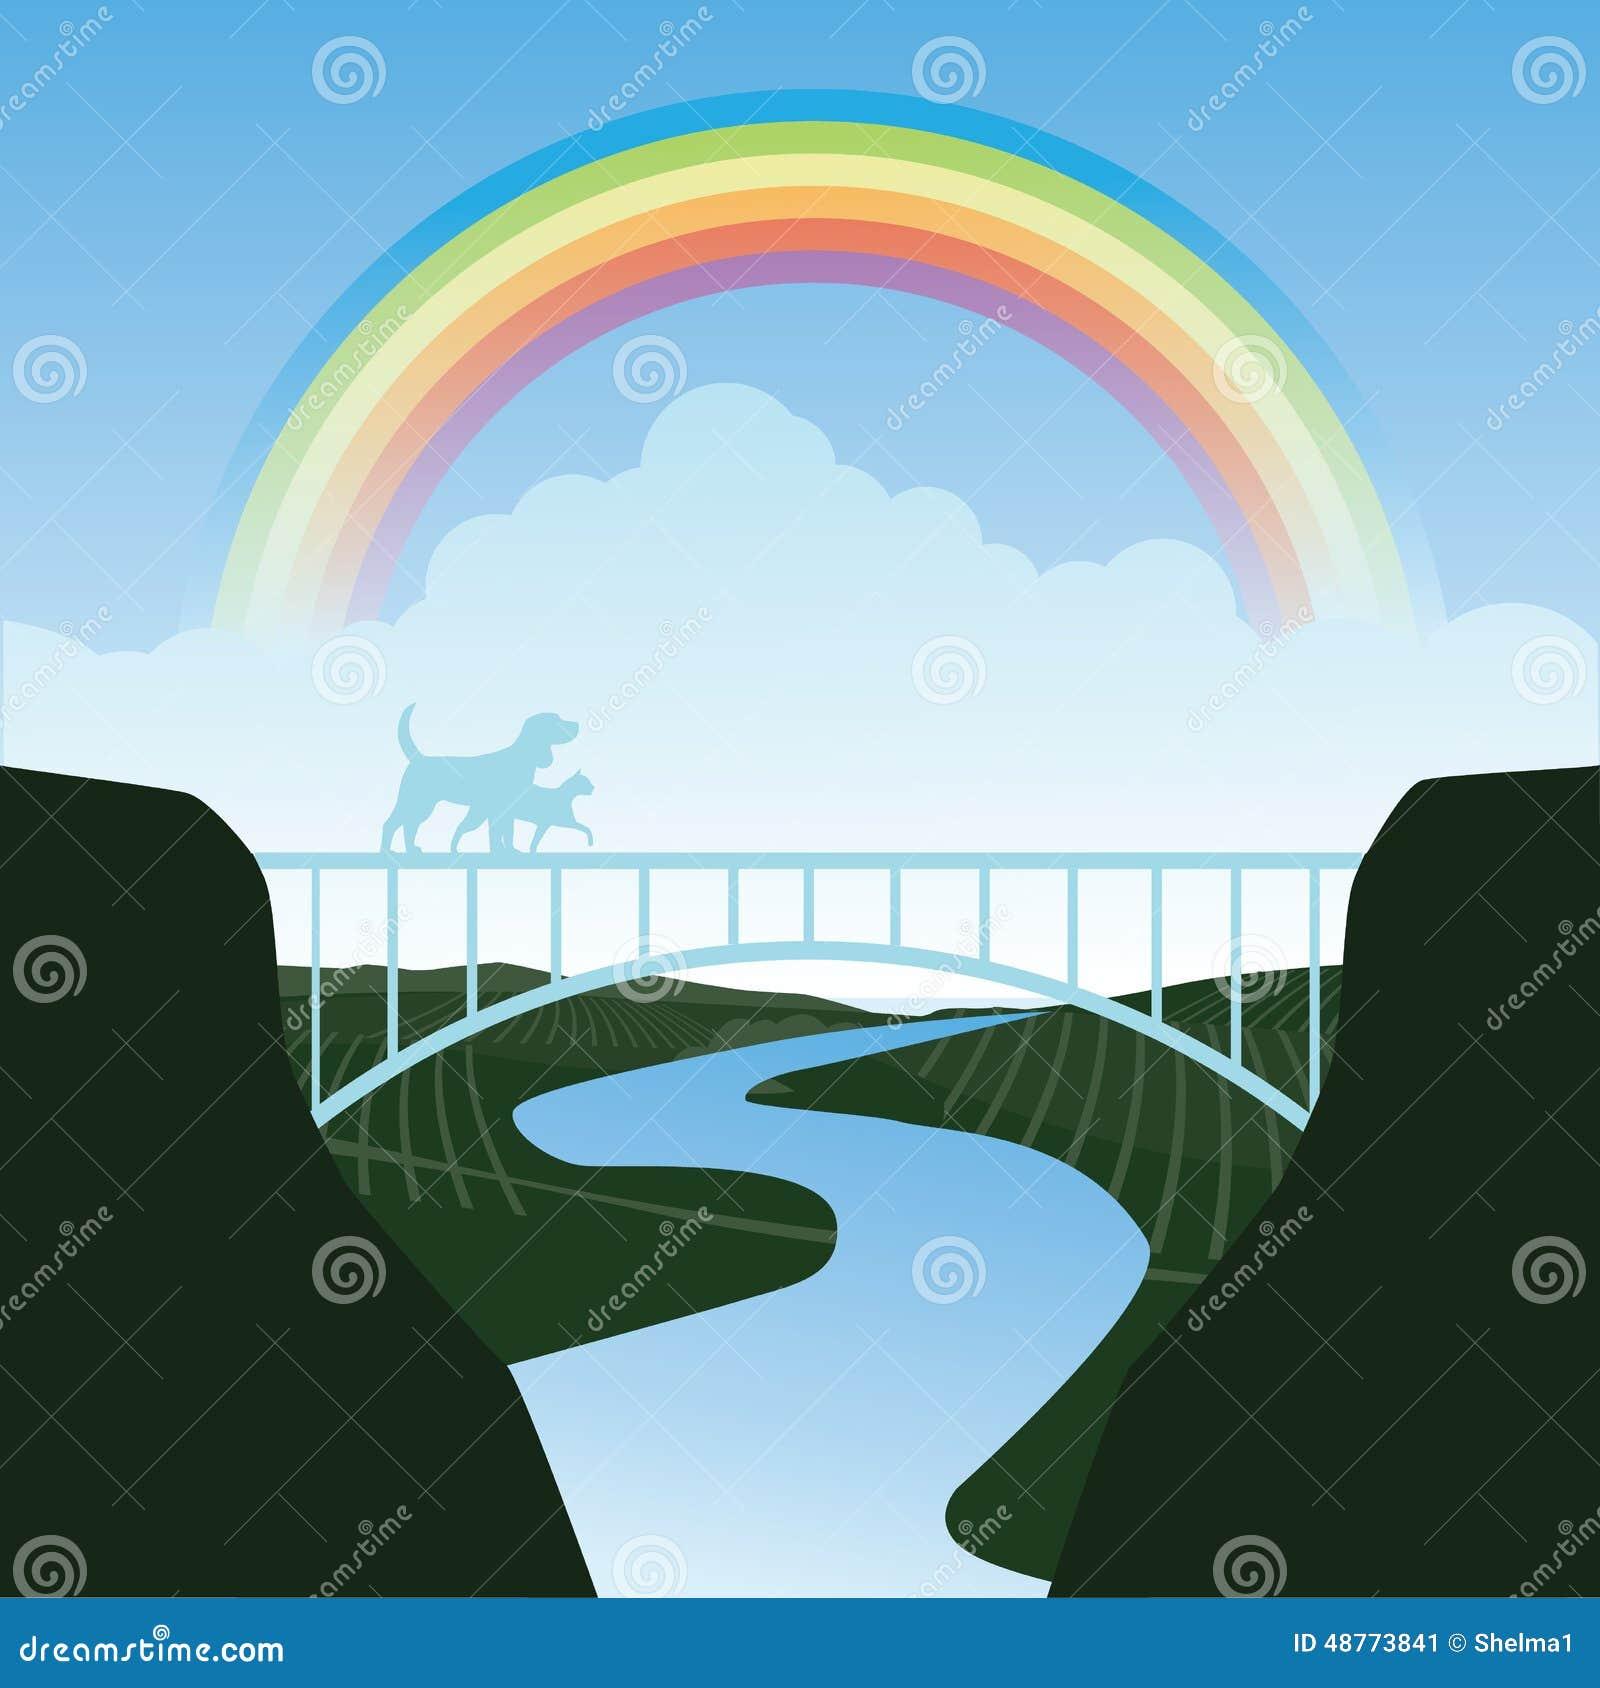 rainbow bridge stock illustrations 406 rainbow bridge stock rh dreamstime com Wood Bridge Clip Art London Bridge Clip Art